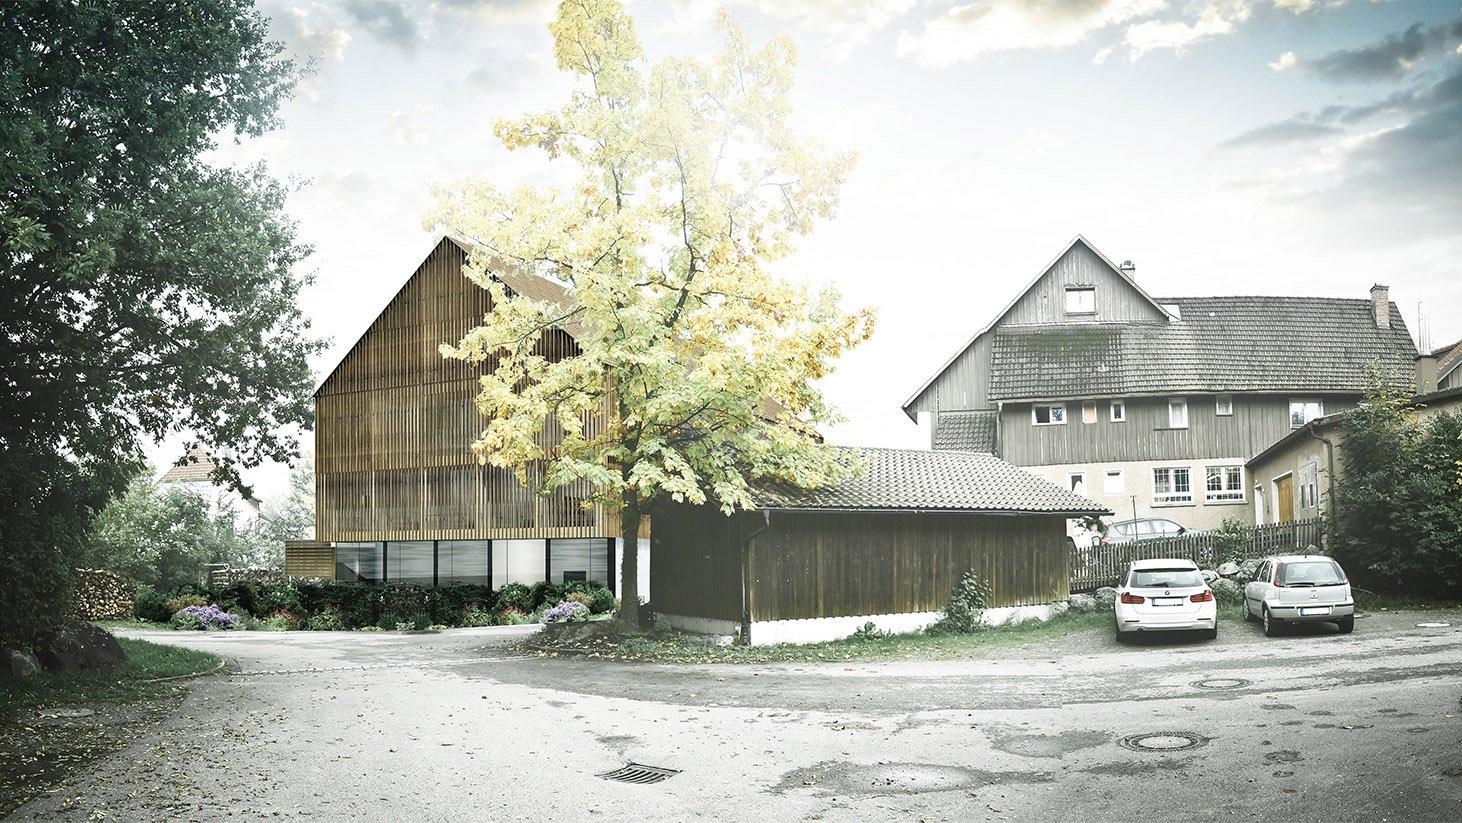 rendering markus tauber architectura}